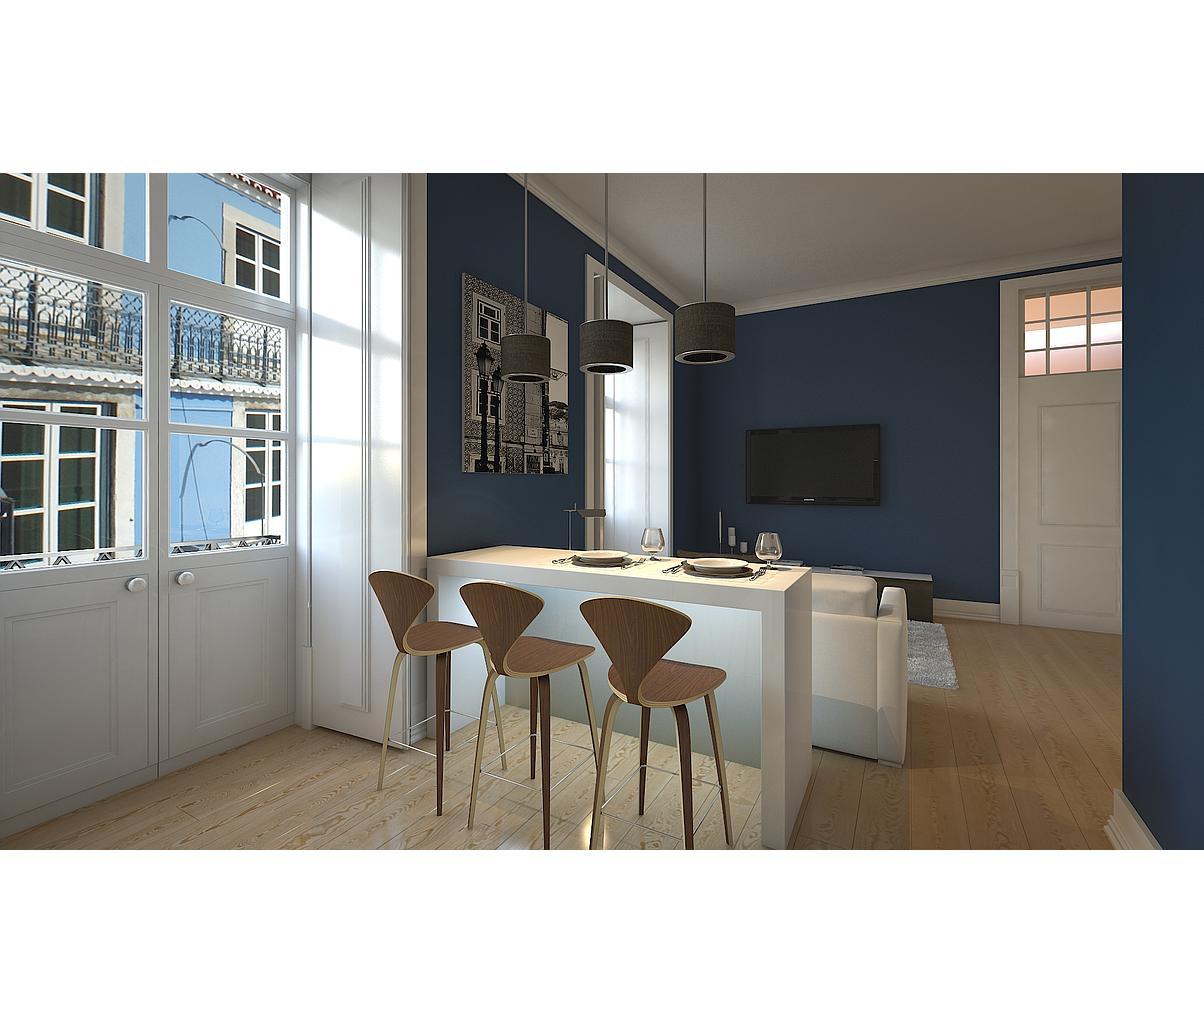 PF07960, Apartamento T1, Lisboa